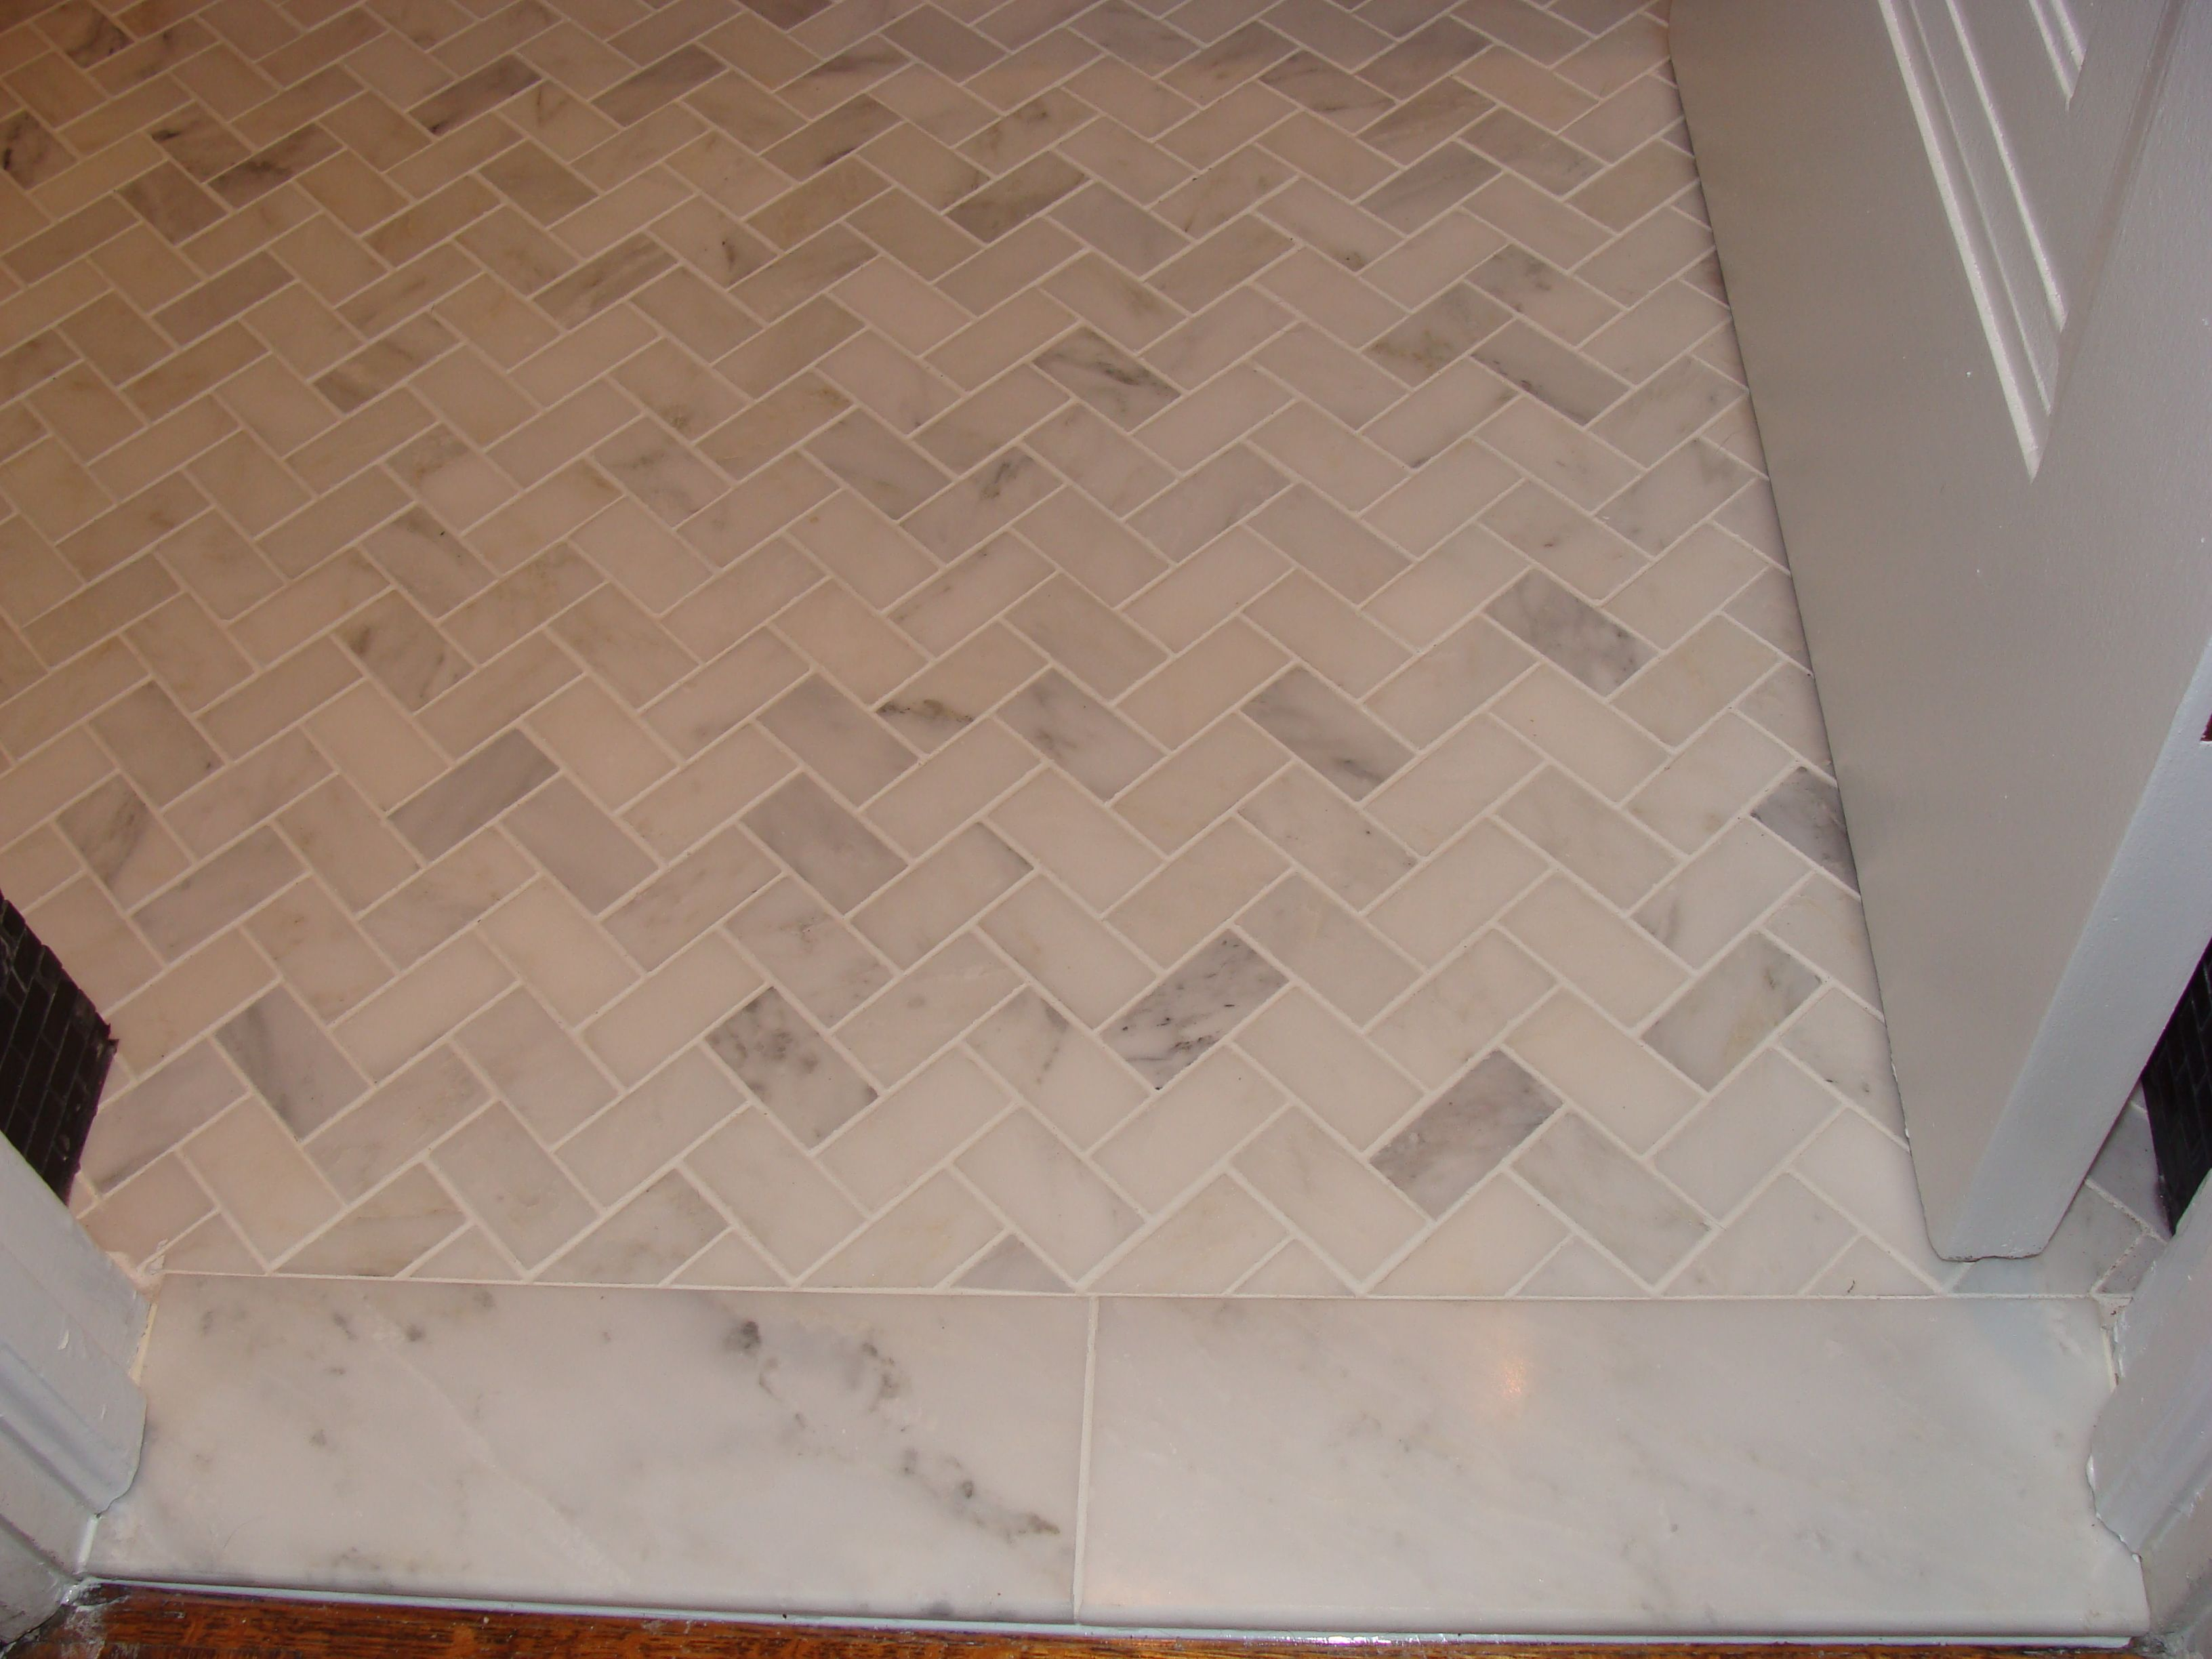 Marble Tile Flooring Ideas: Marble Tile Floor, Herringbone Layout